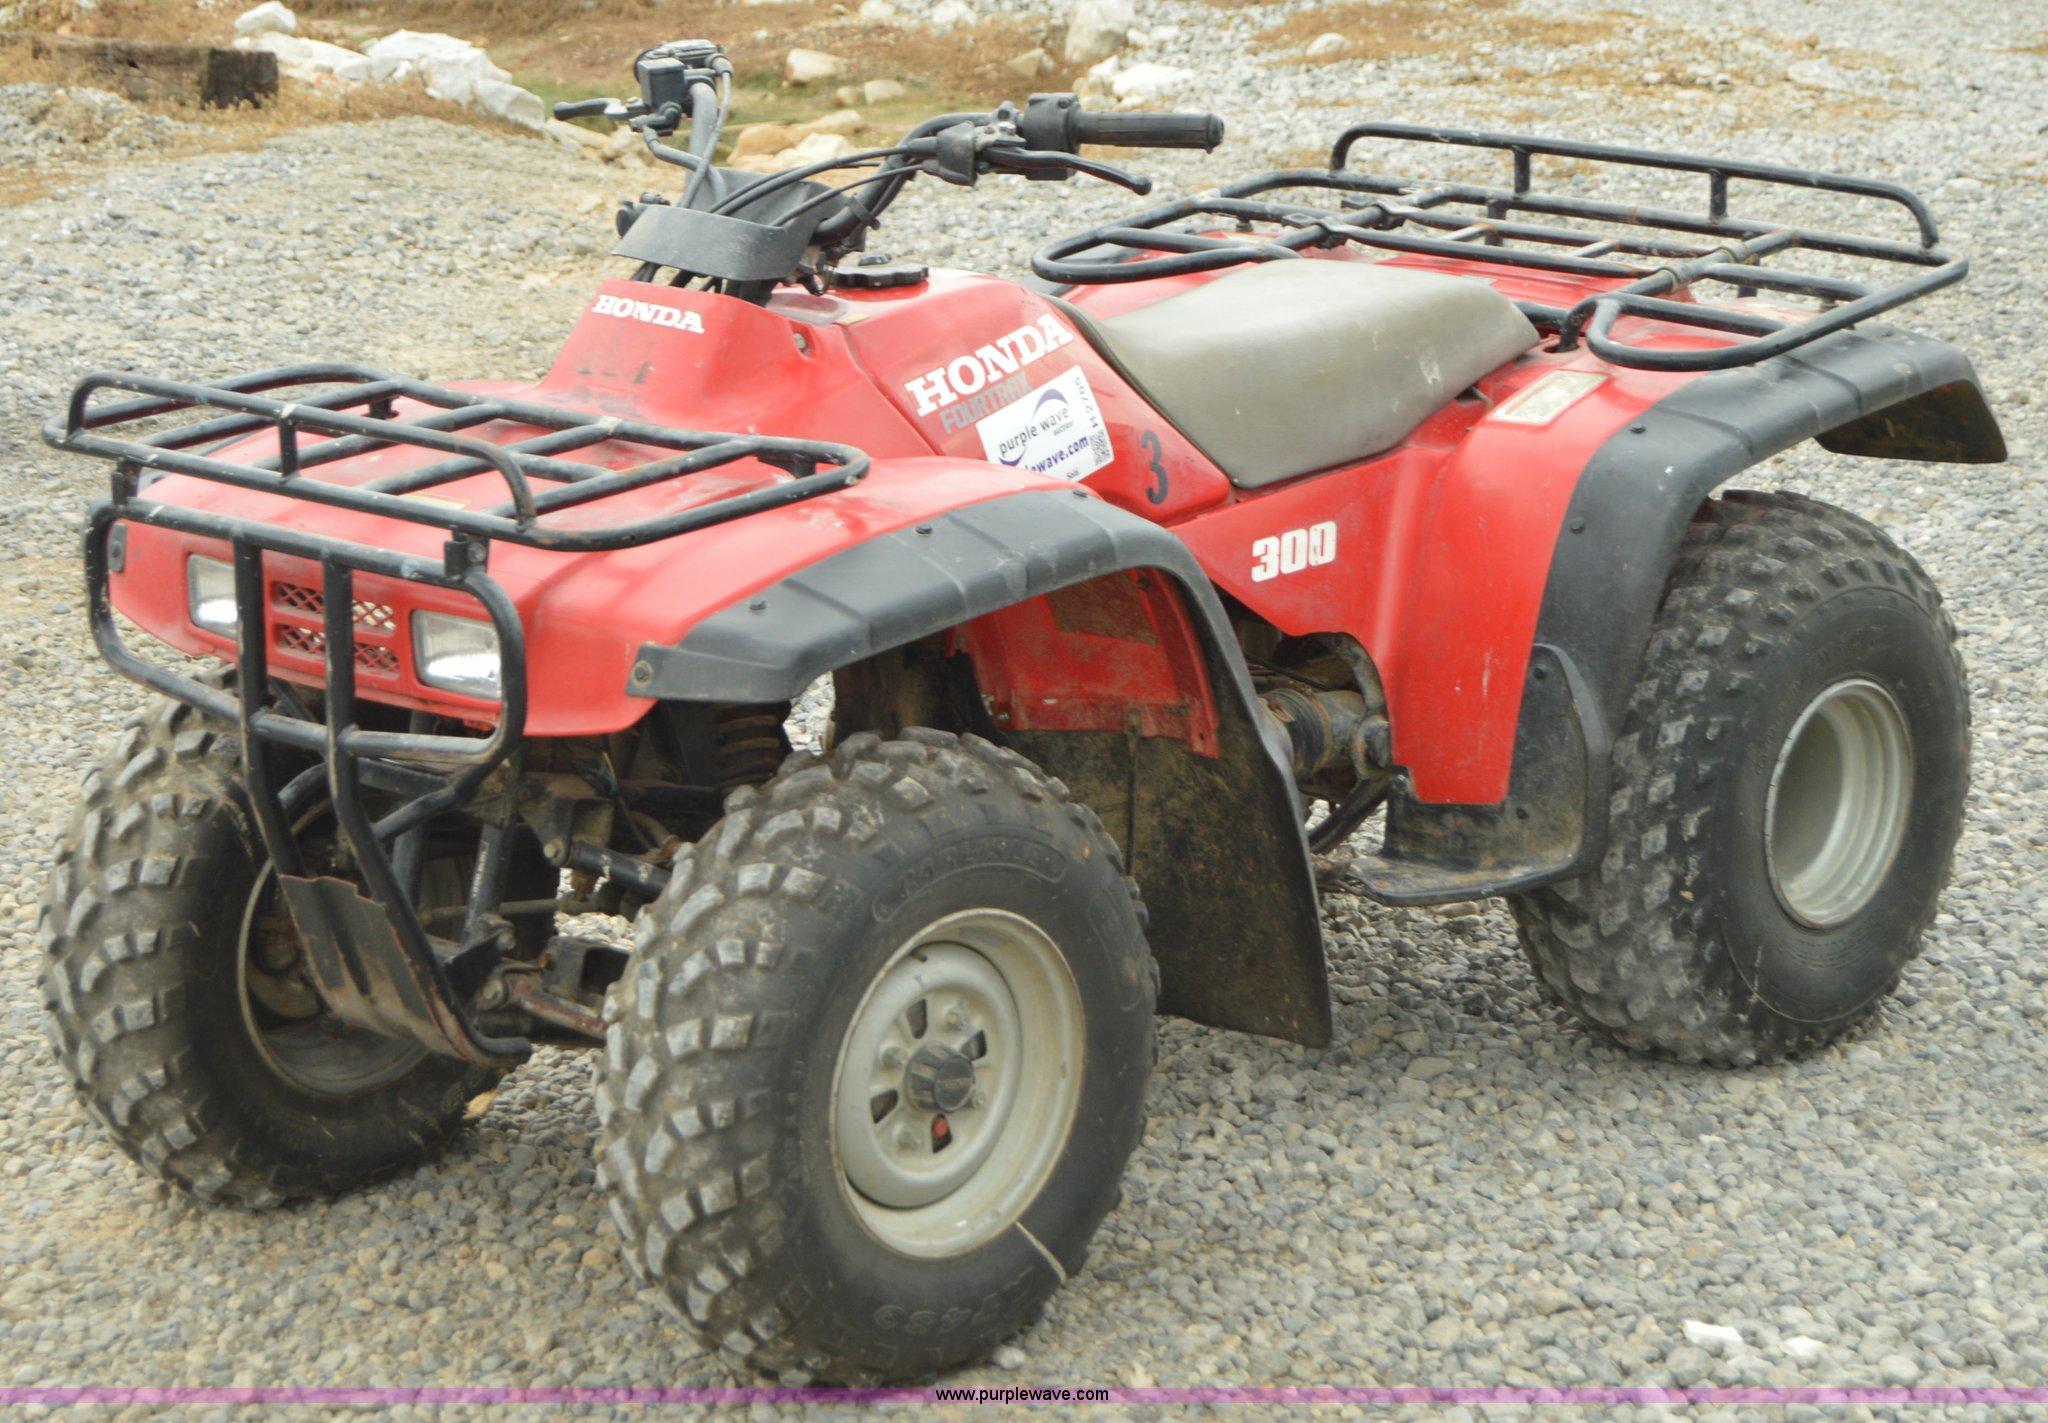 1996 Honda Fourtrax Atv 200 Winch Wiring Diagram Four Trax 300 Item H2765 Sold September Rh Purplewave Com Foreman Used Parts